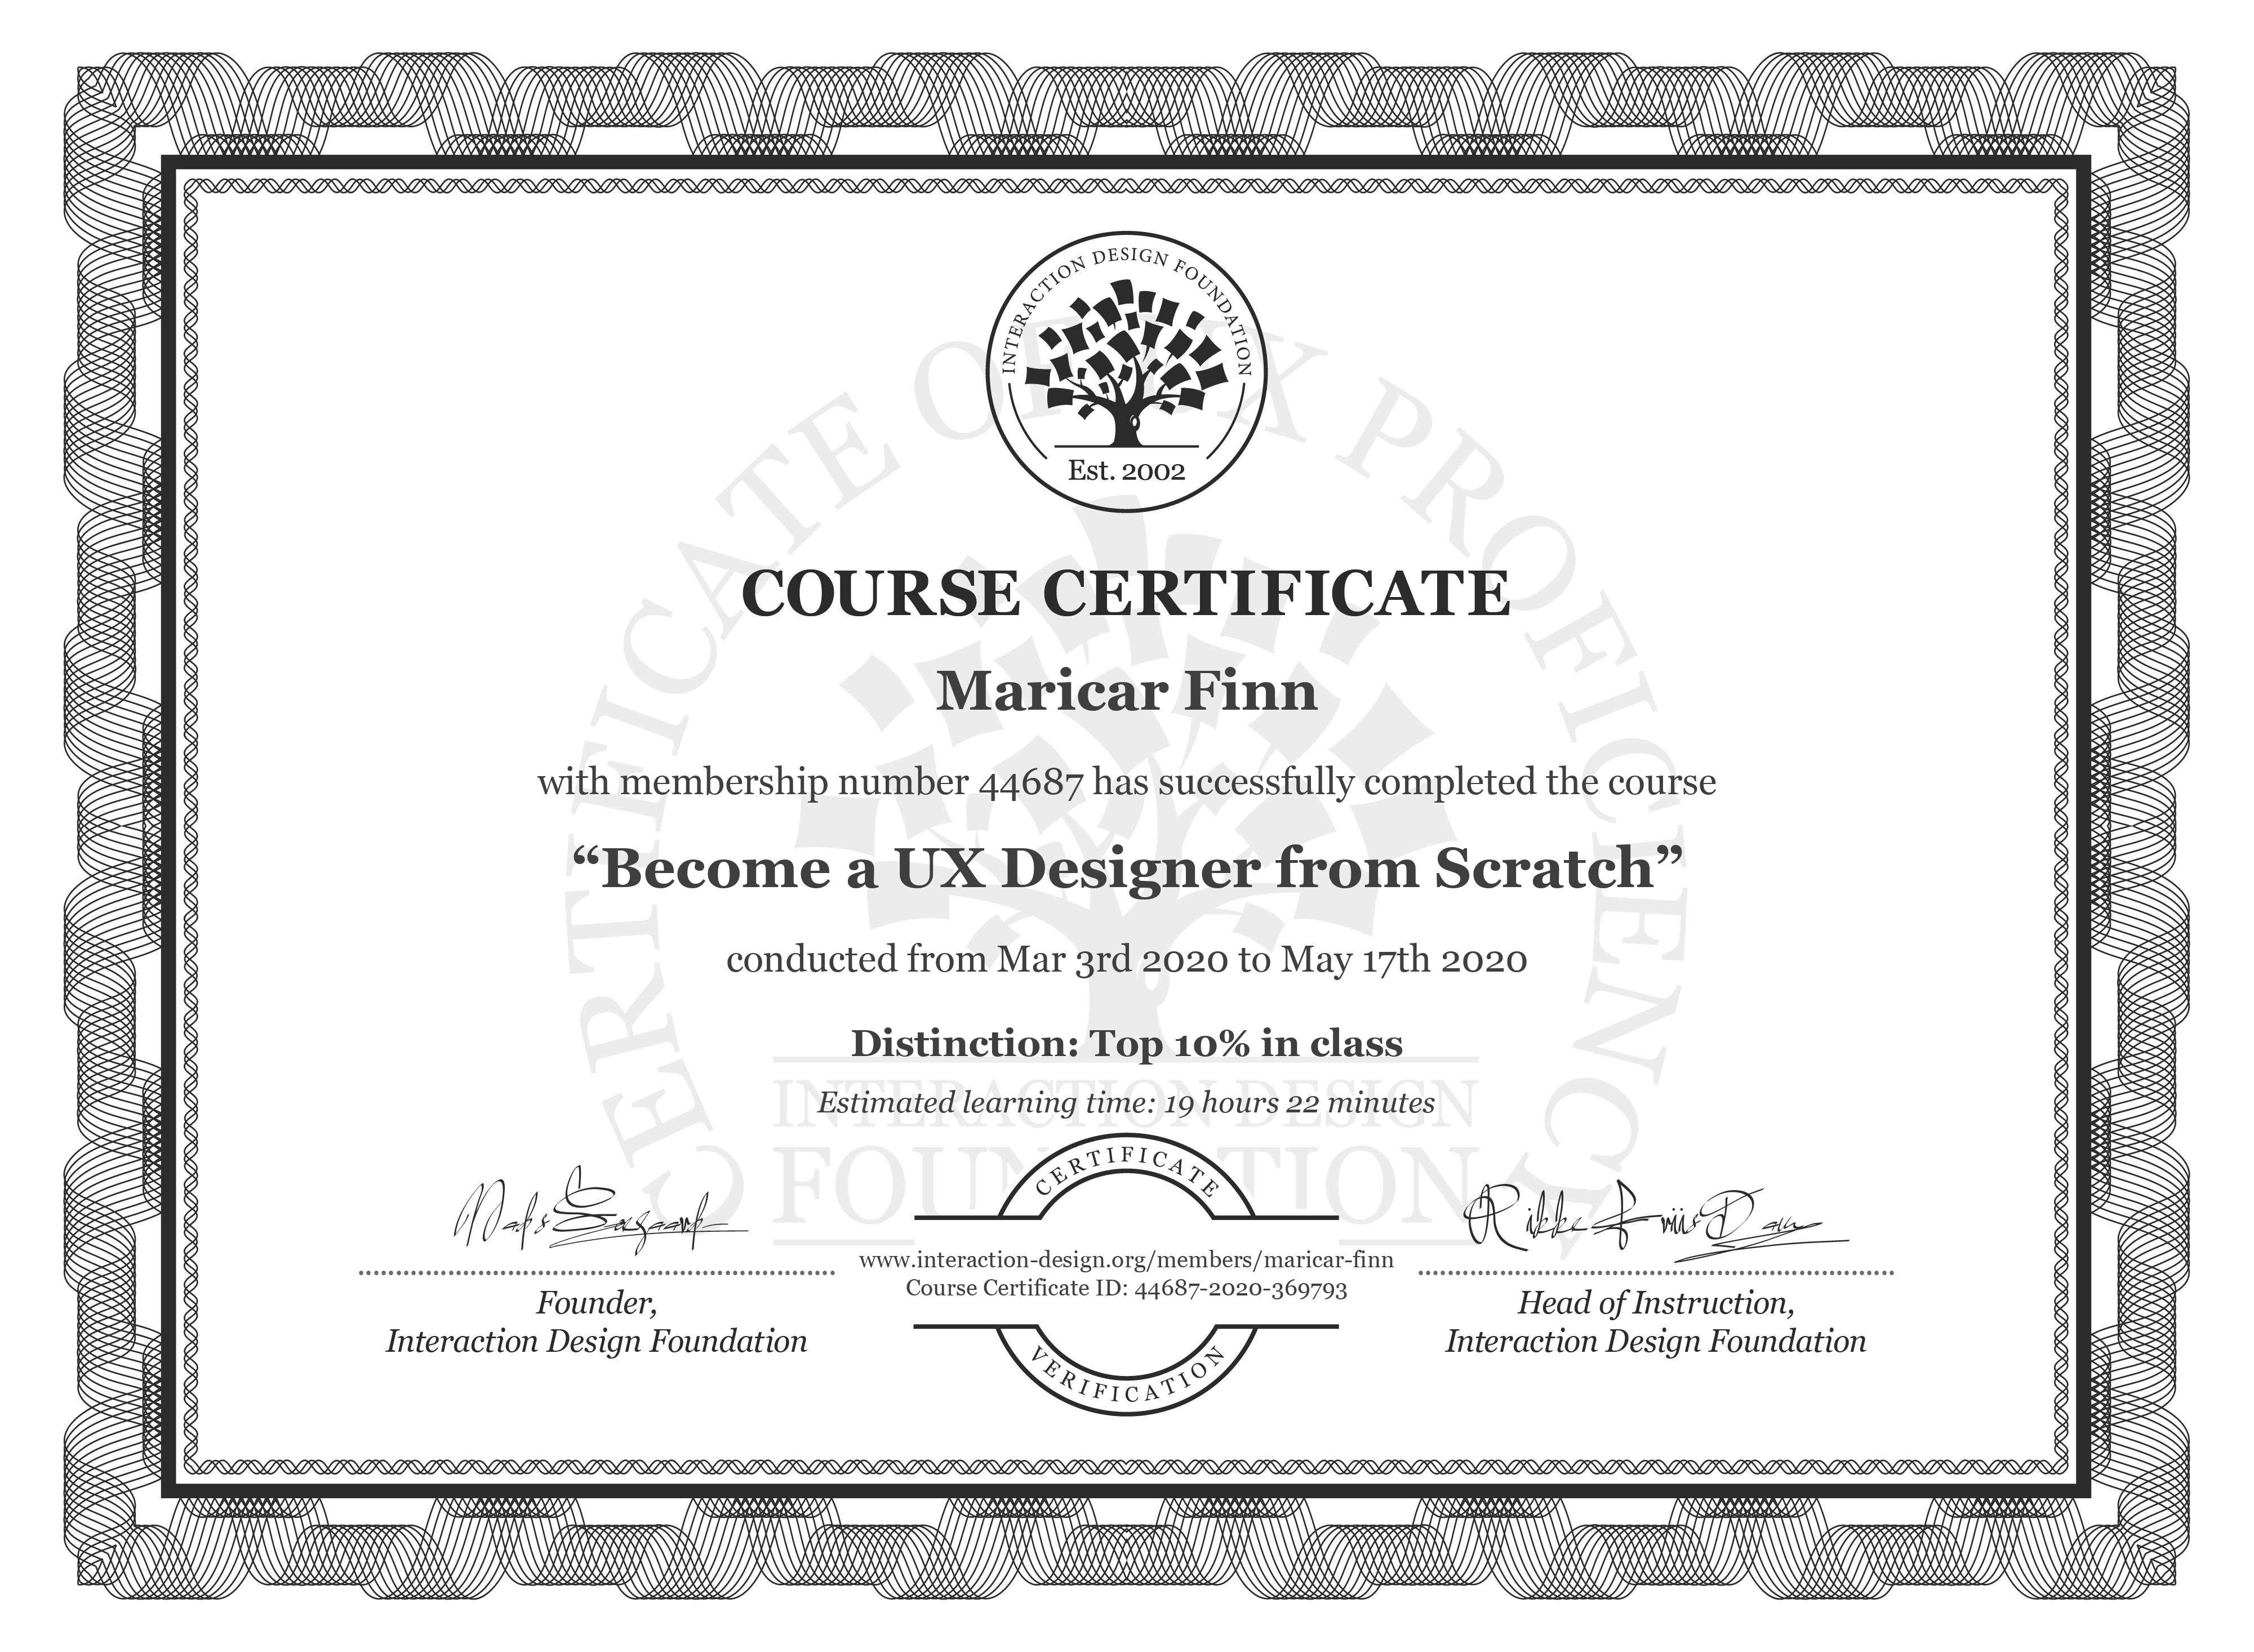 Maricar Finn's Course Certificate: User Experience: The Beginner's Guide